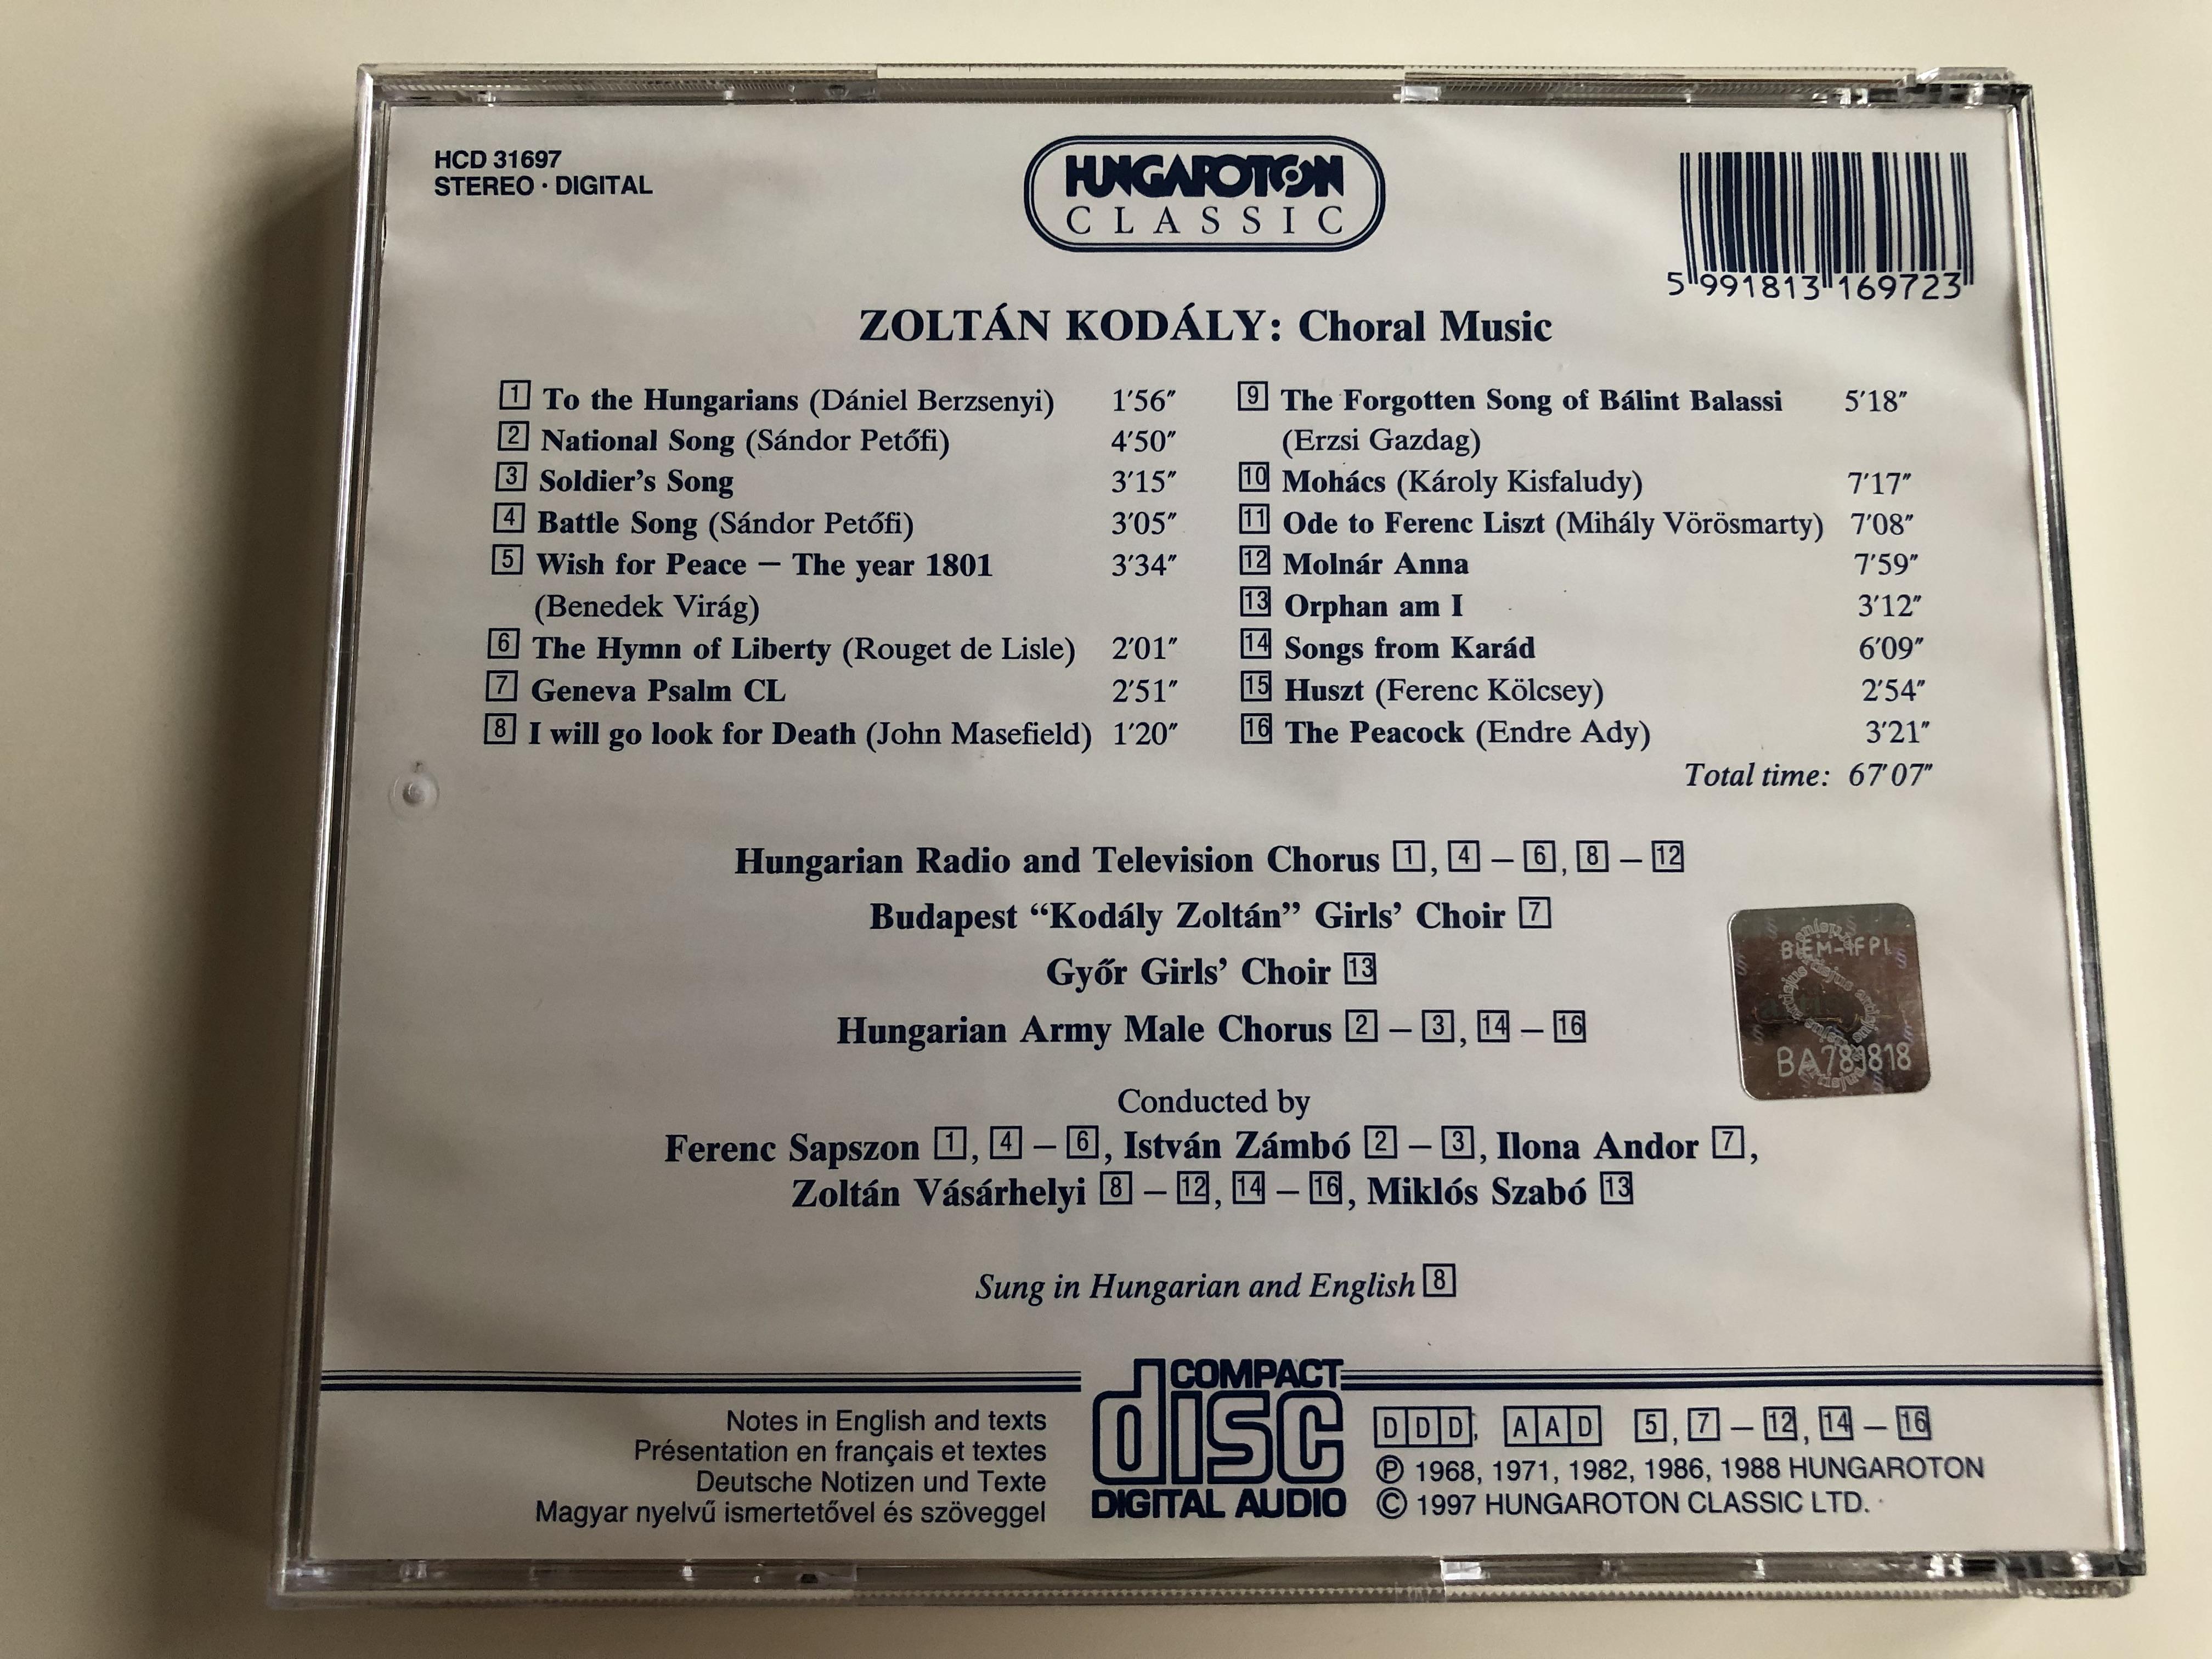 kod-ly-choral-music-vol.-3-audio-cd-1997-a-magyarokhoz-nemzeti-dal-moh-cs-liszt-ferencnek-hungarian-rtv-chorus-budapest-kod-ly-girl-s-choir-gy-r-girls-choir-hungarian-army-male-chorus-conductors-ferenc-sapszon-il-6488181-.jpg